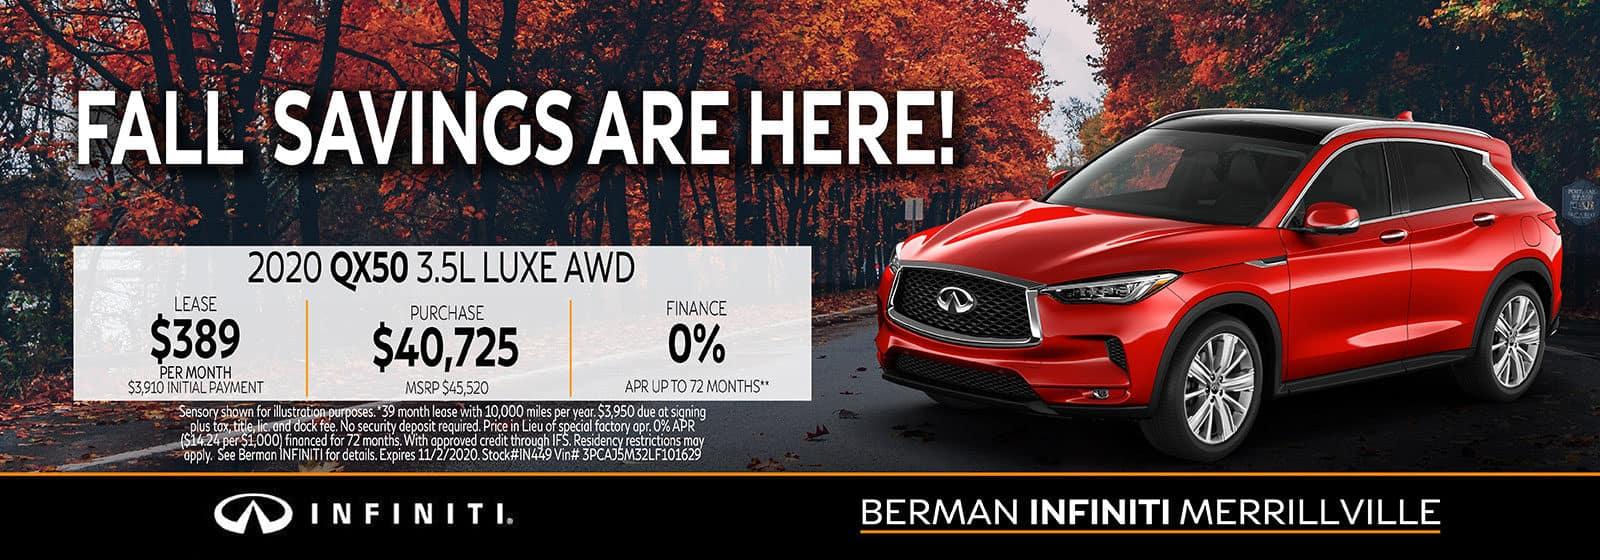 New 2020 INFINITI QX50 October Offer at Berman INFINITI of Merrillville!